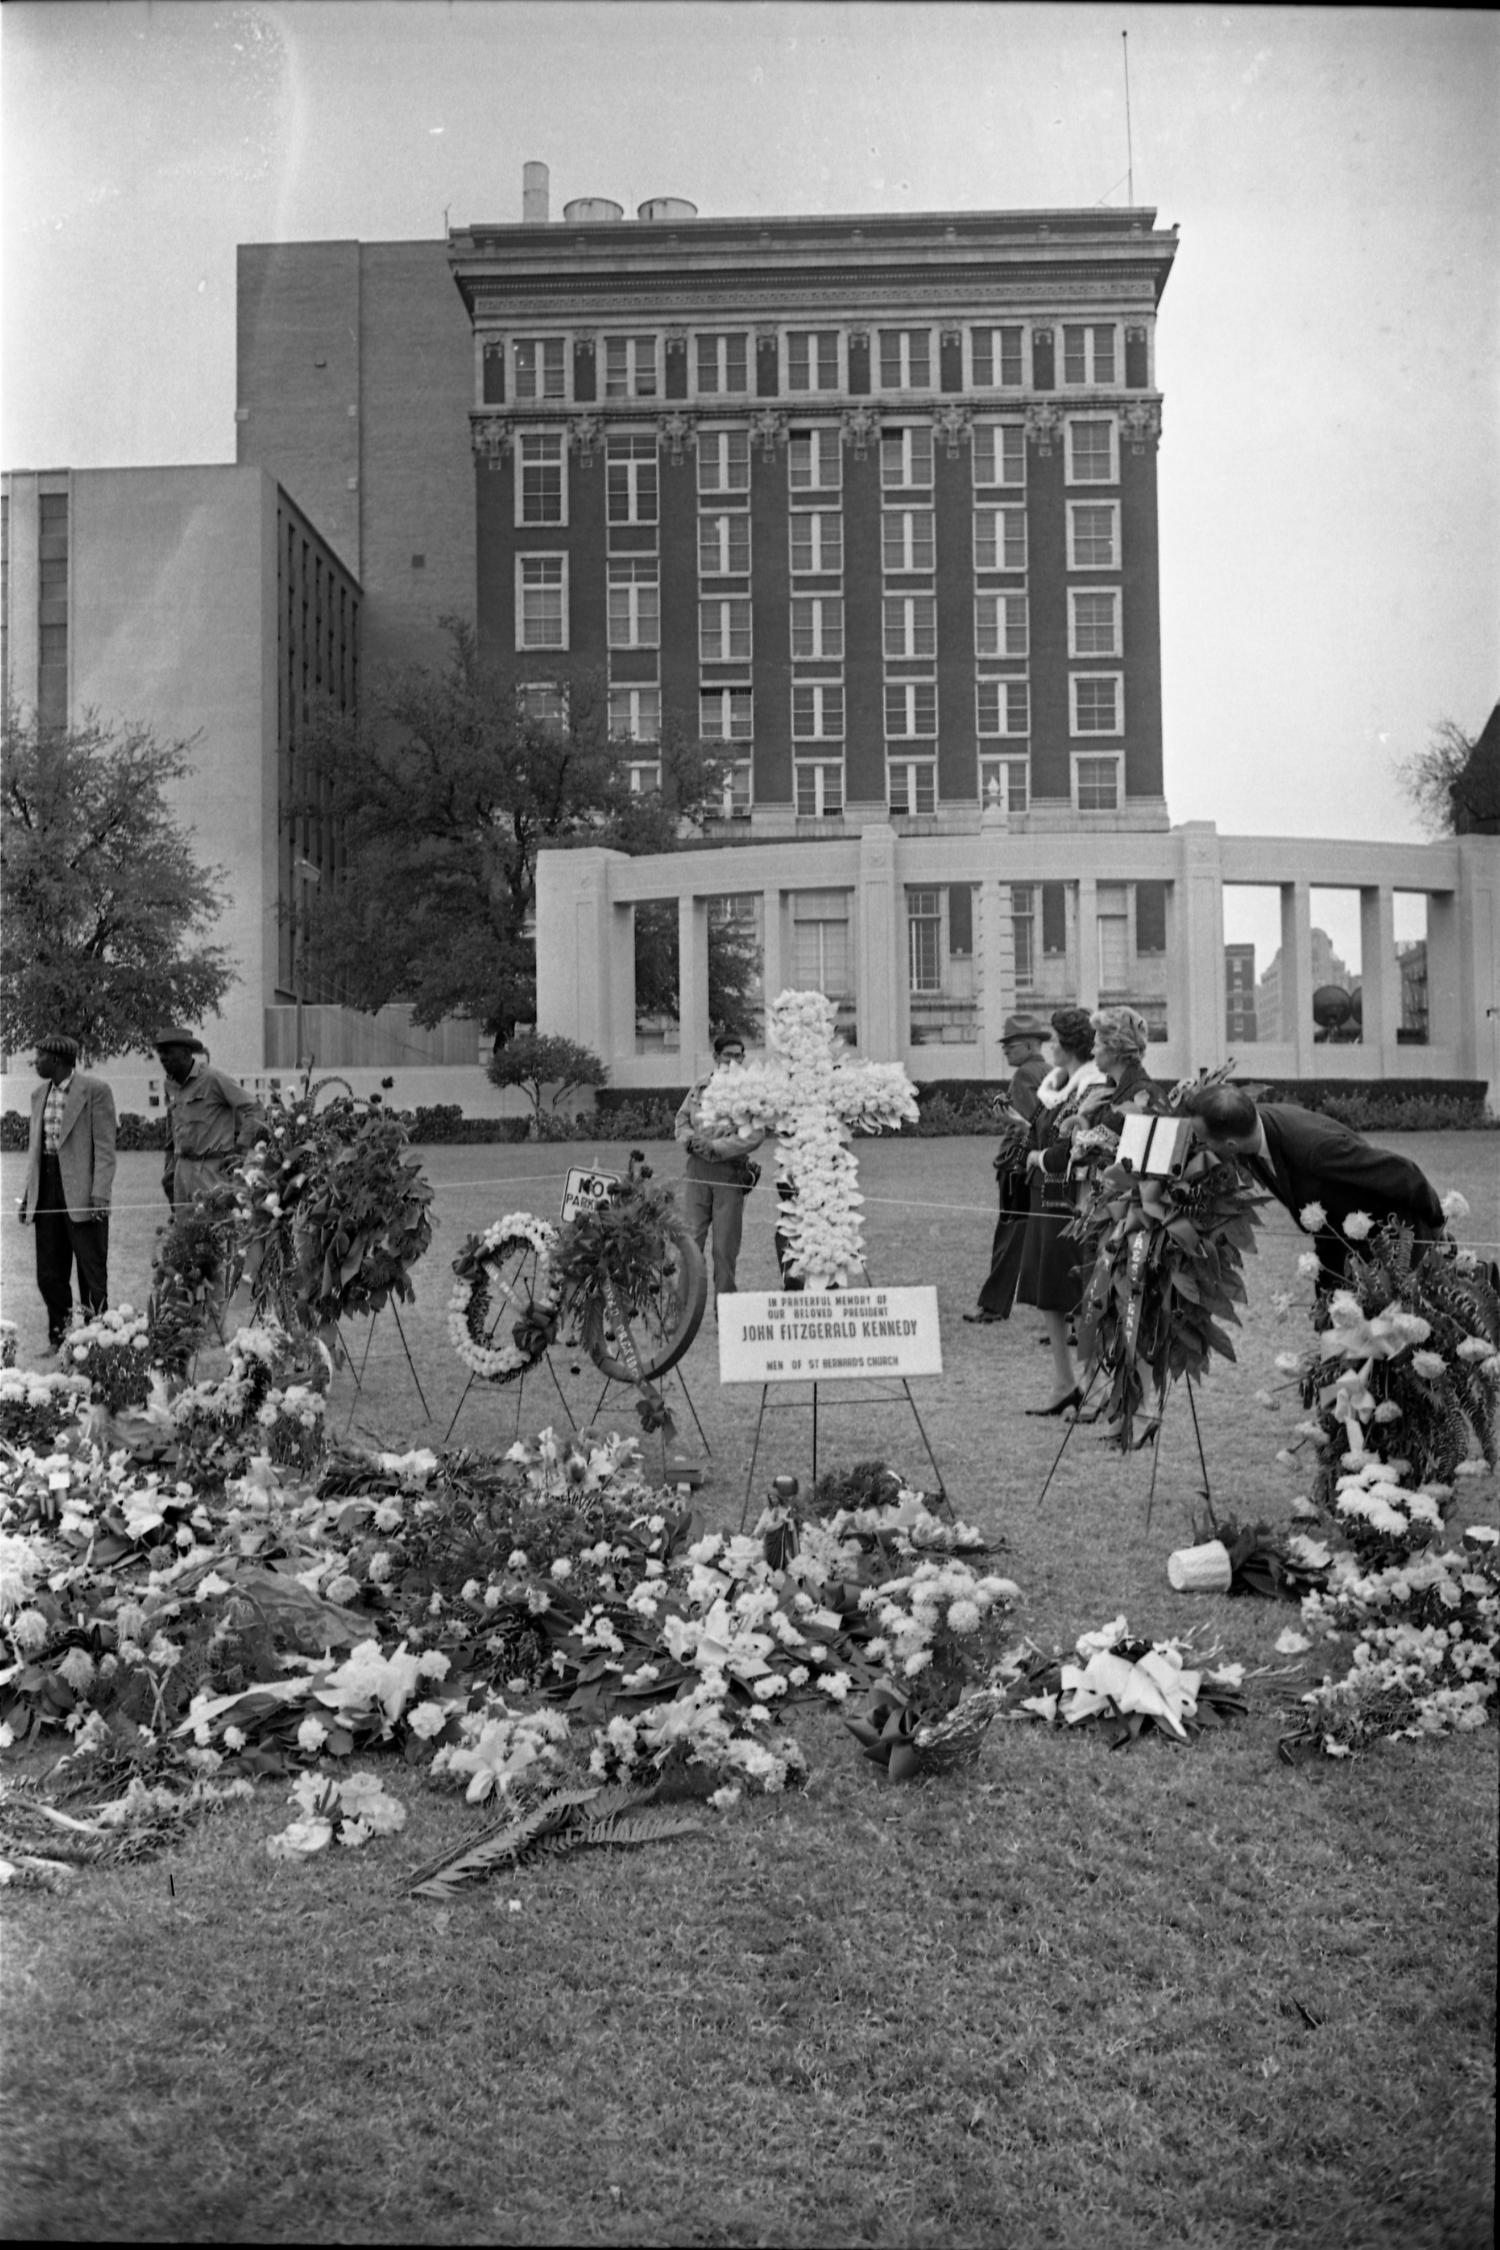 Memorial Flower Arrangements In Dealey Plaza On November